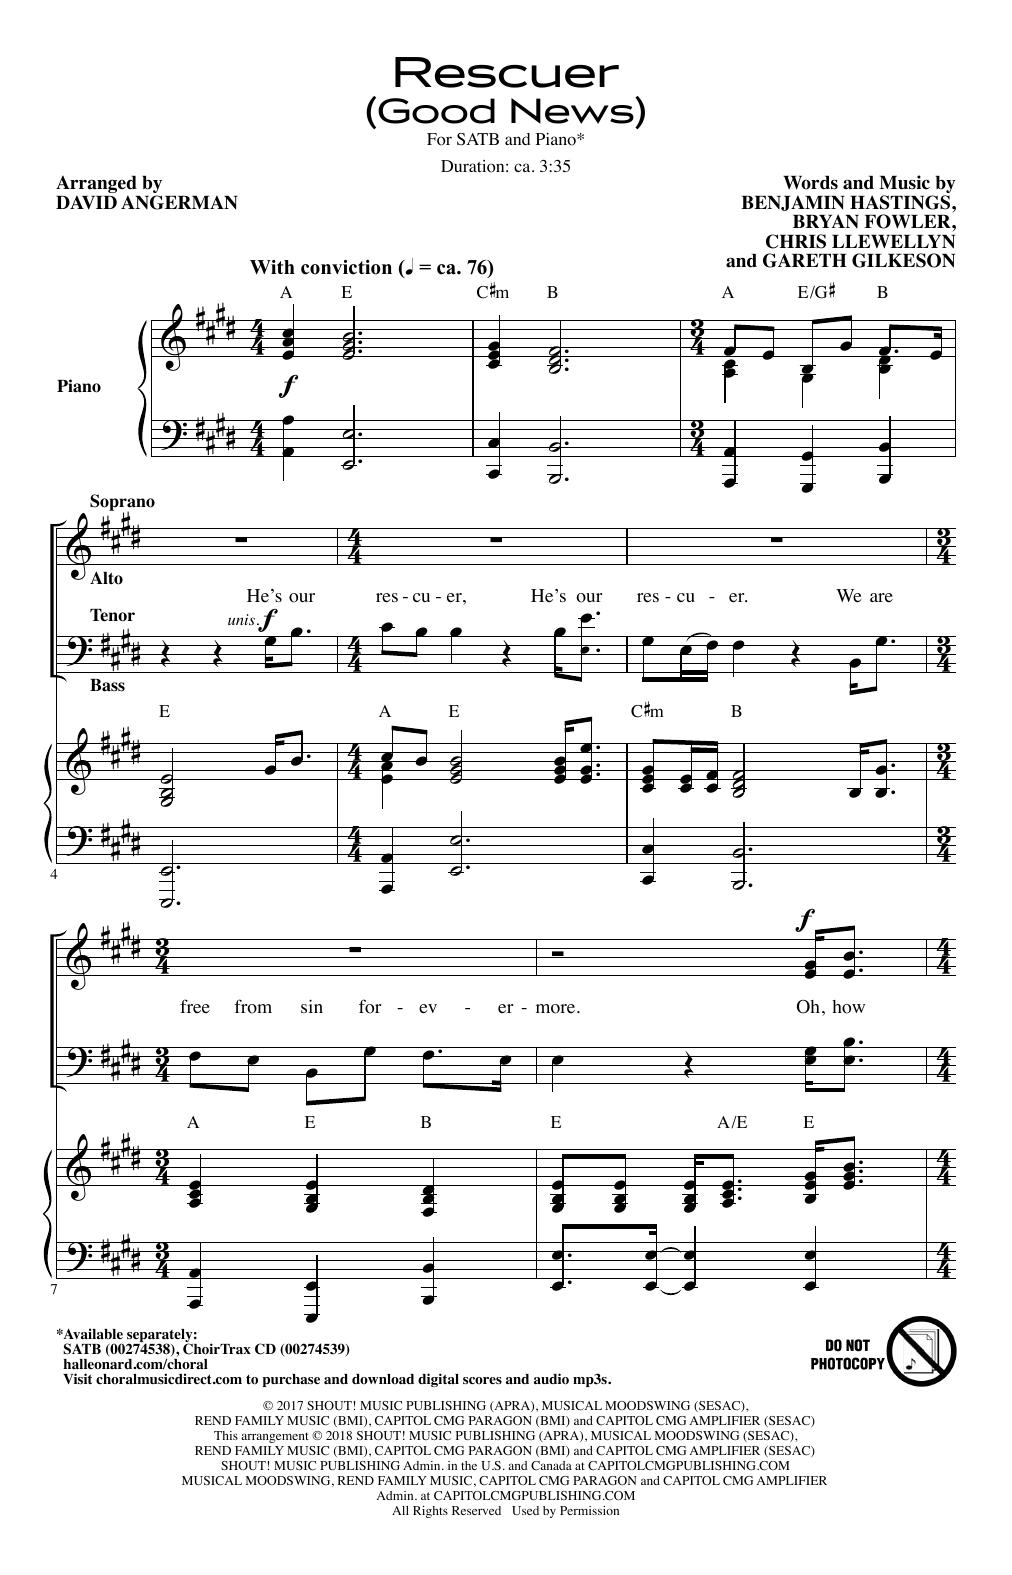 Rescuer (Good News) (arr. David Angerman) (SATB Choir)